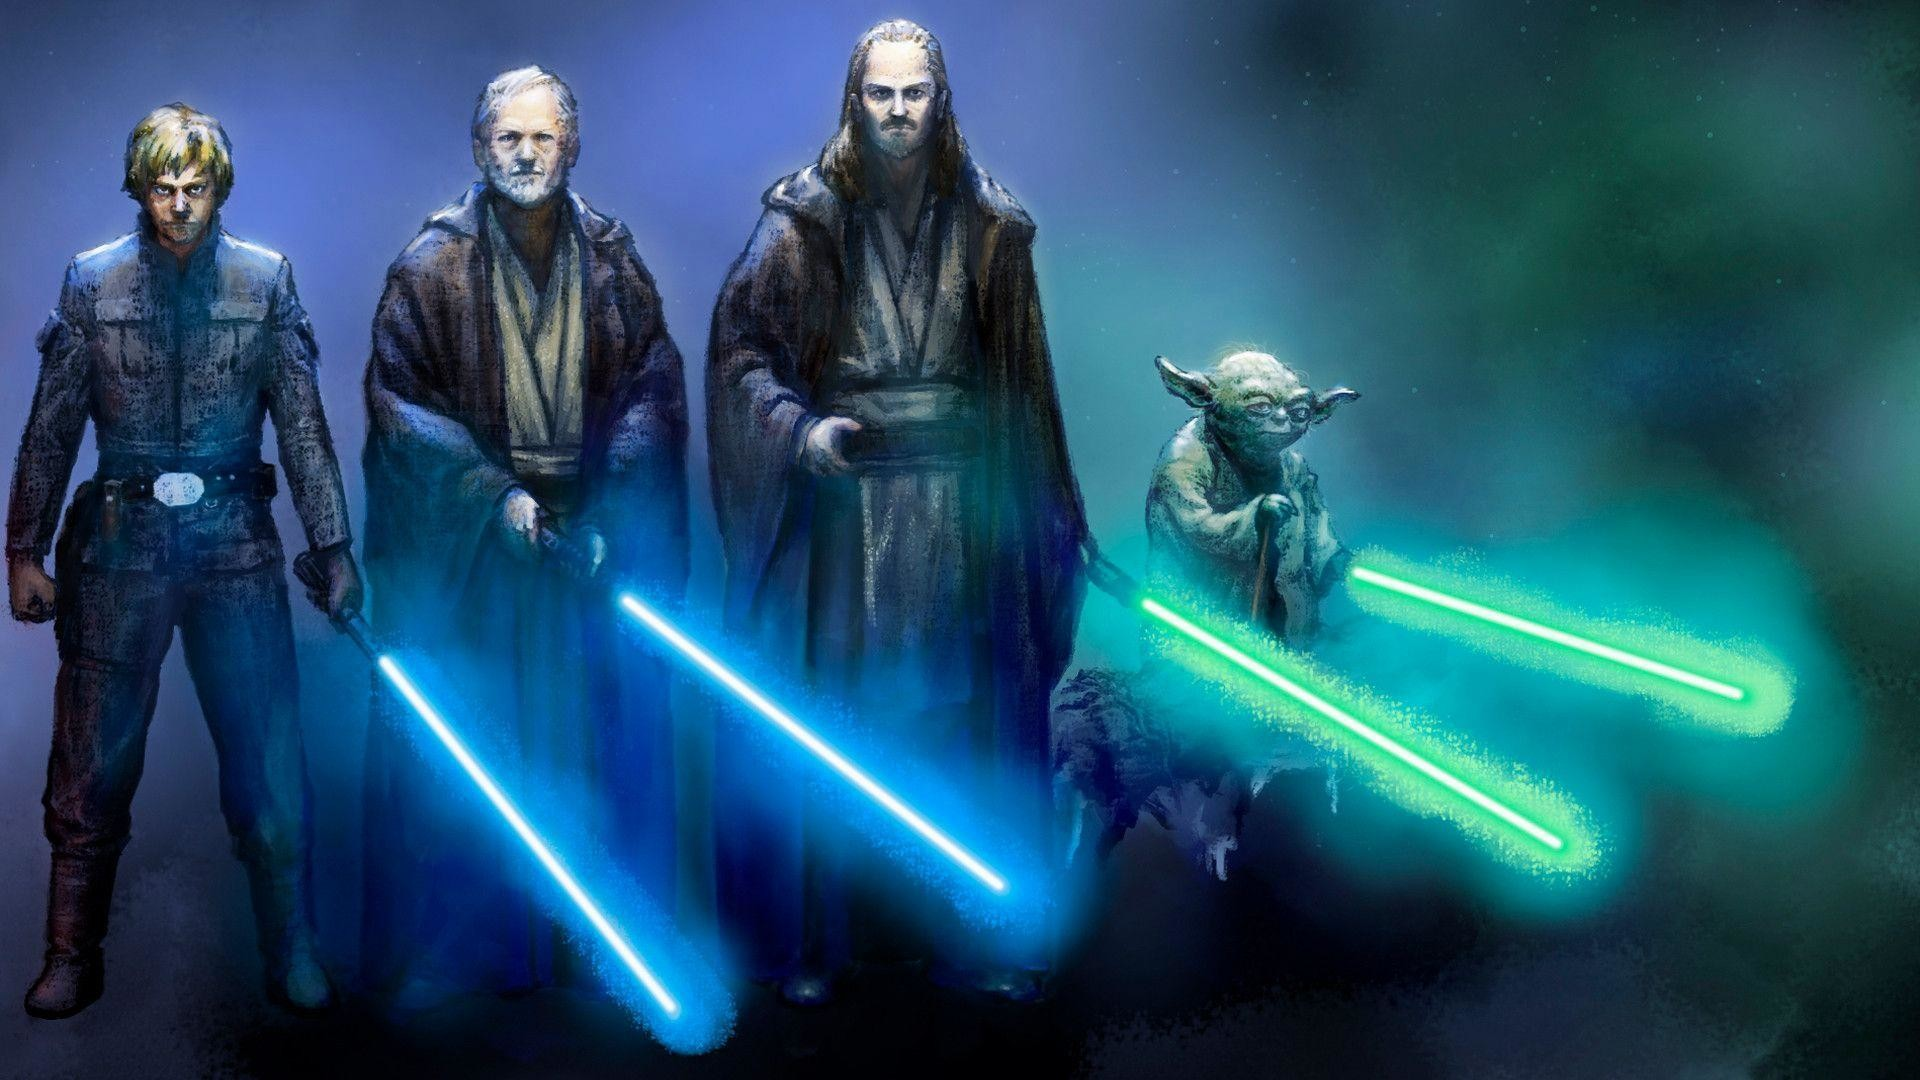 Star Wars Jedi Wallpaper 69 Images